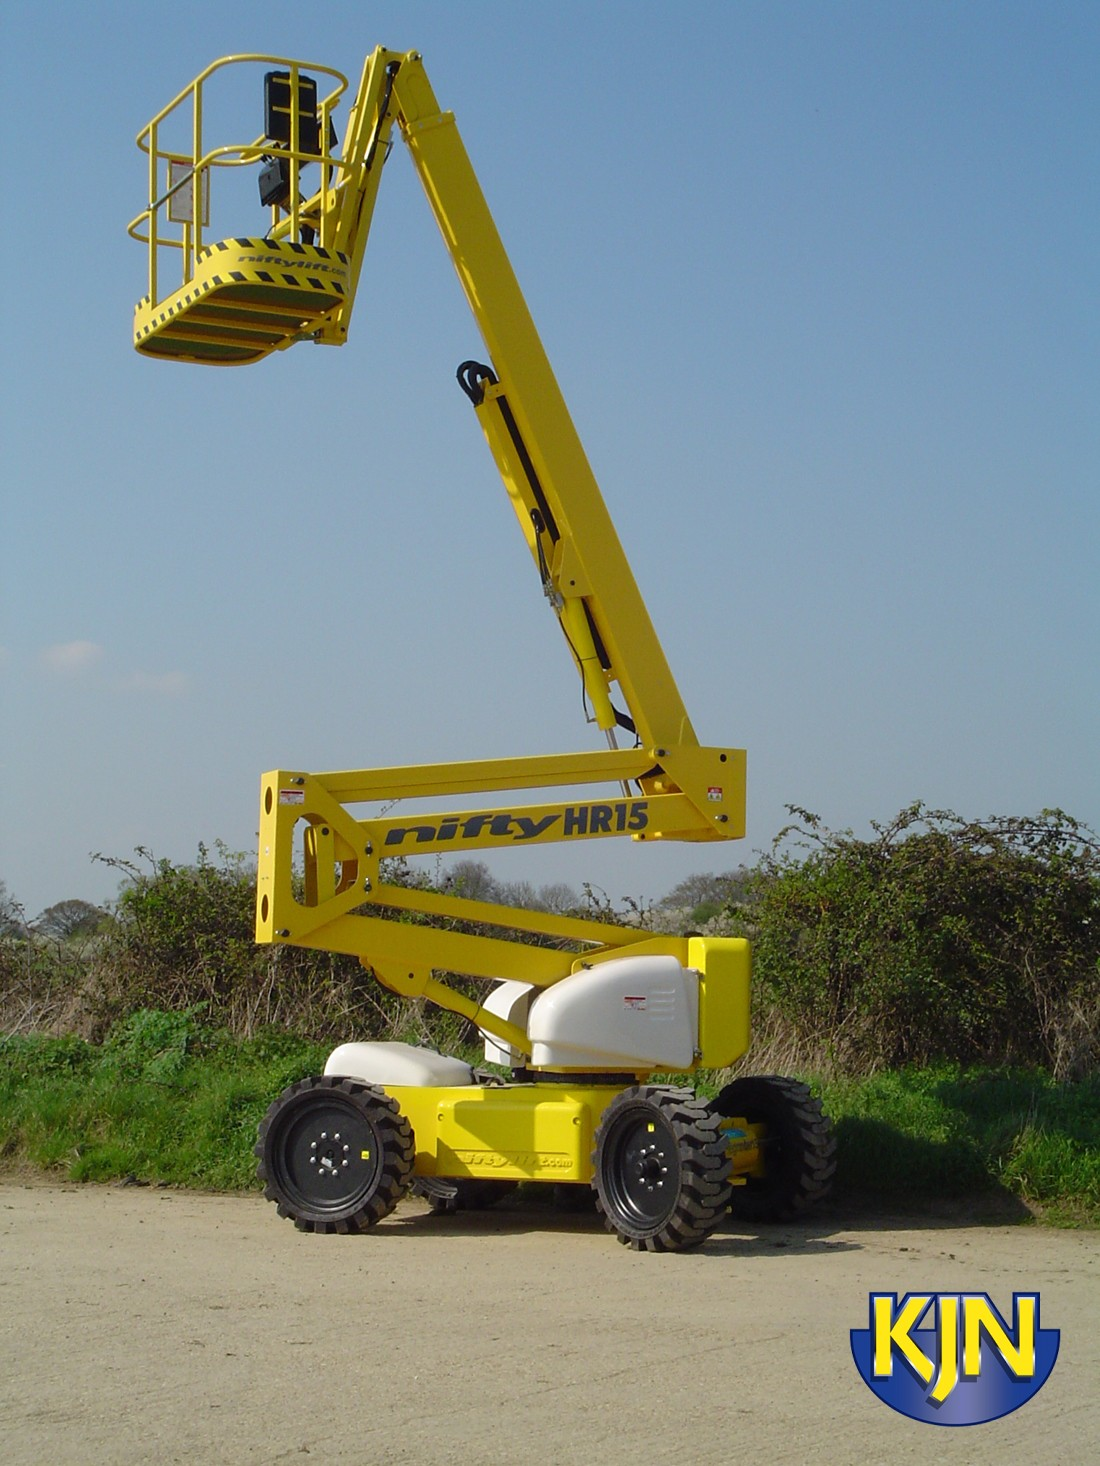 Niftylift HR15D 4WD Self-propelled Platform